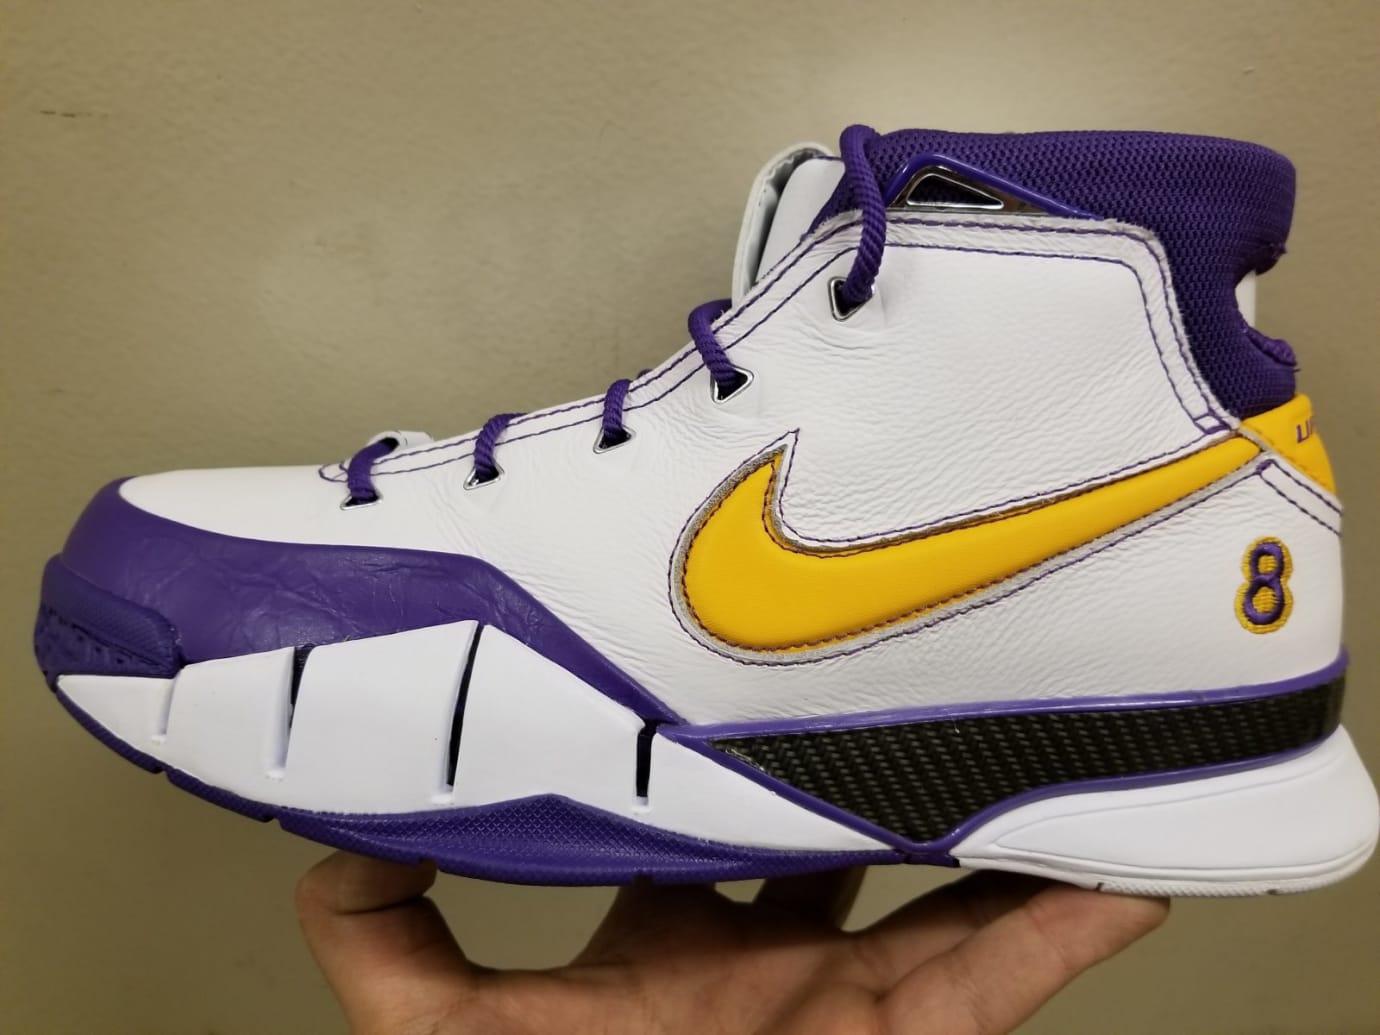 timeless design a924f b1b01 Nike Kobe 1 Protro  Close Out  AQ2728-101